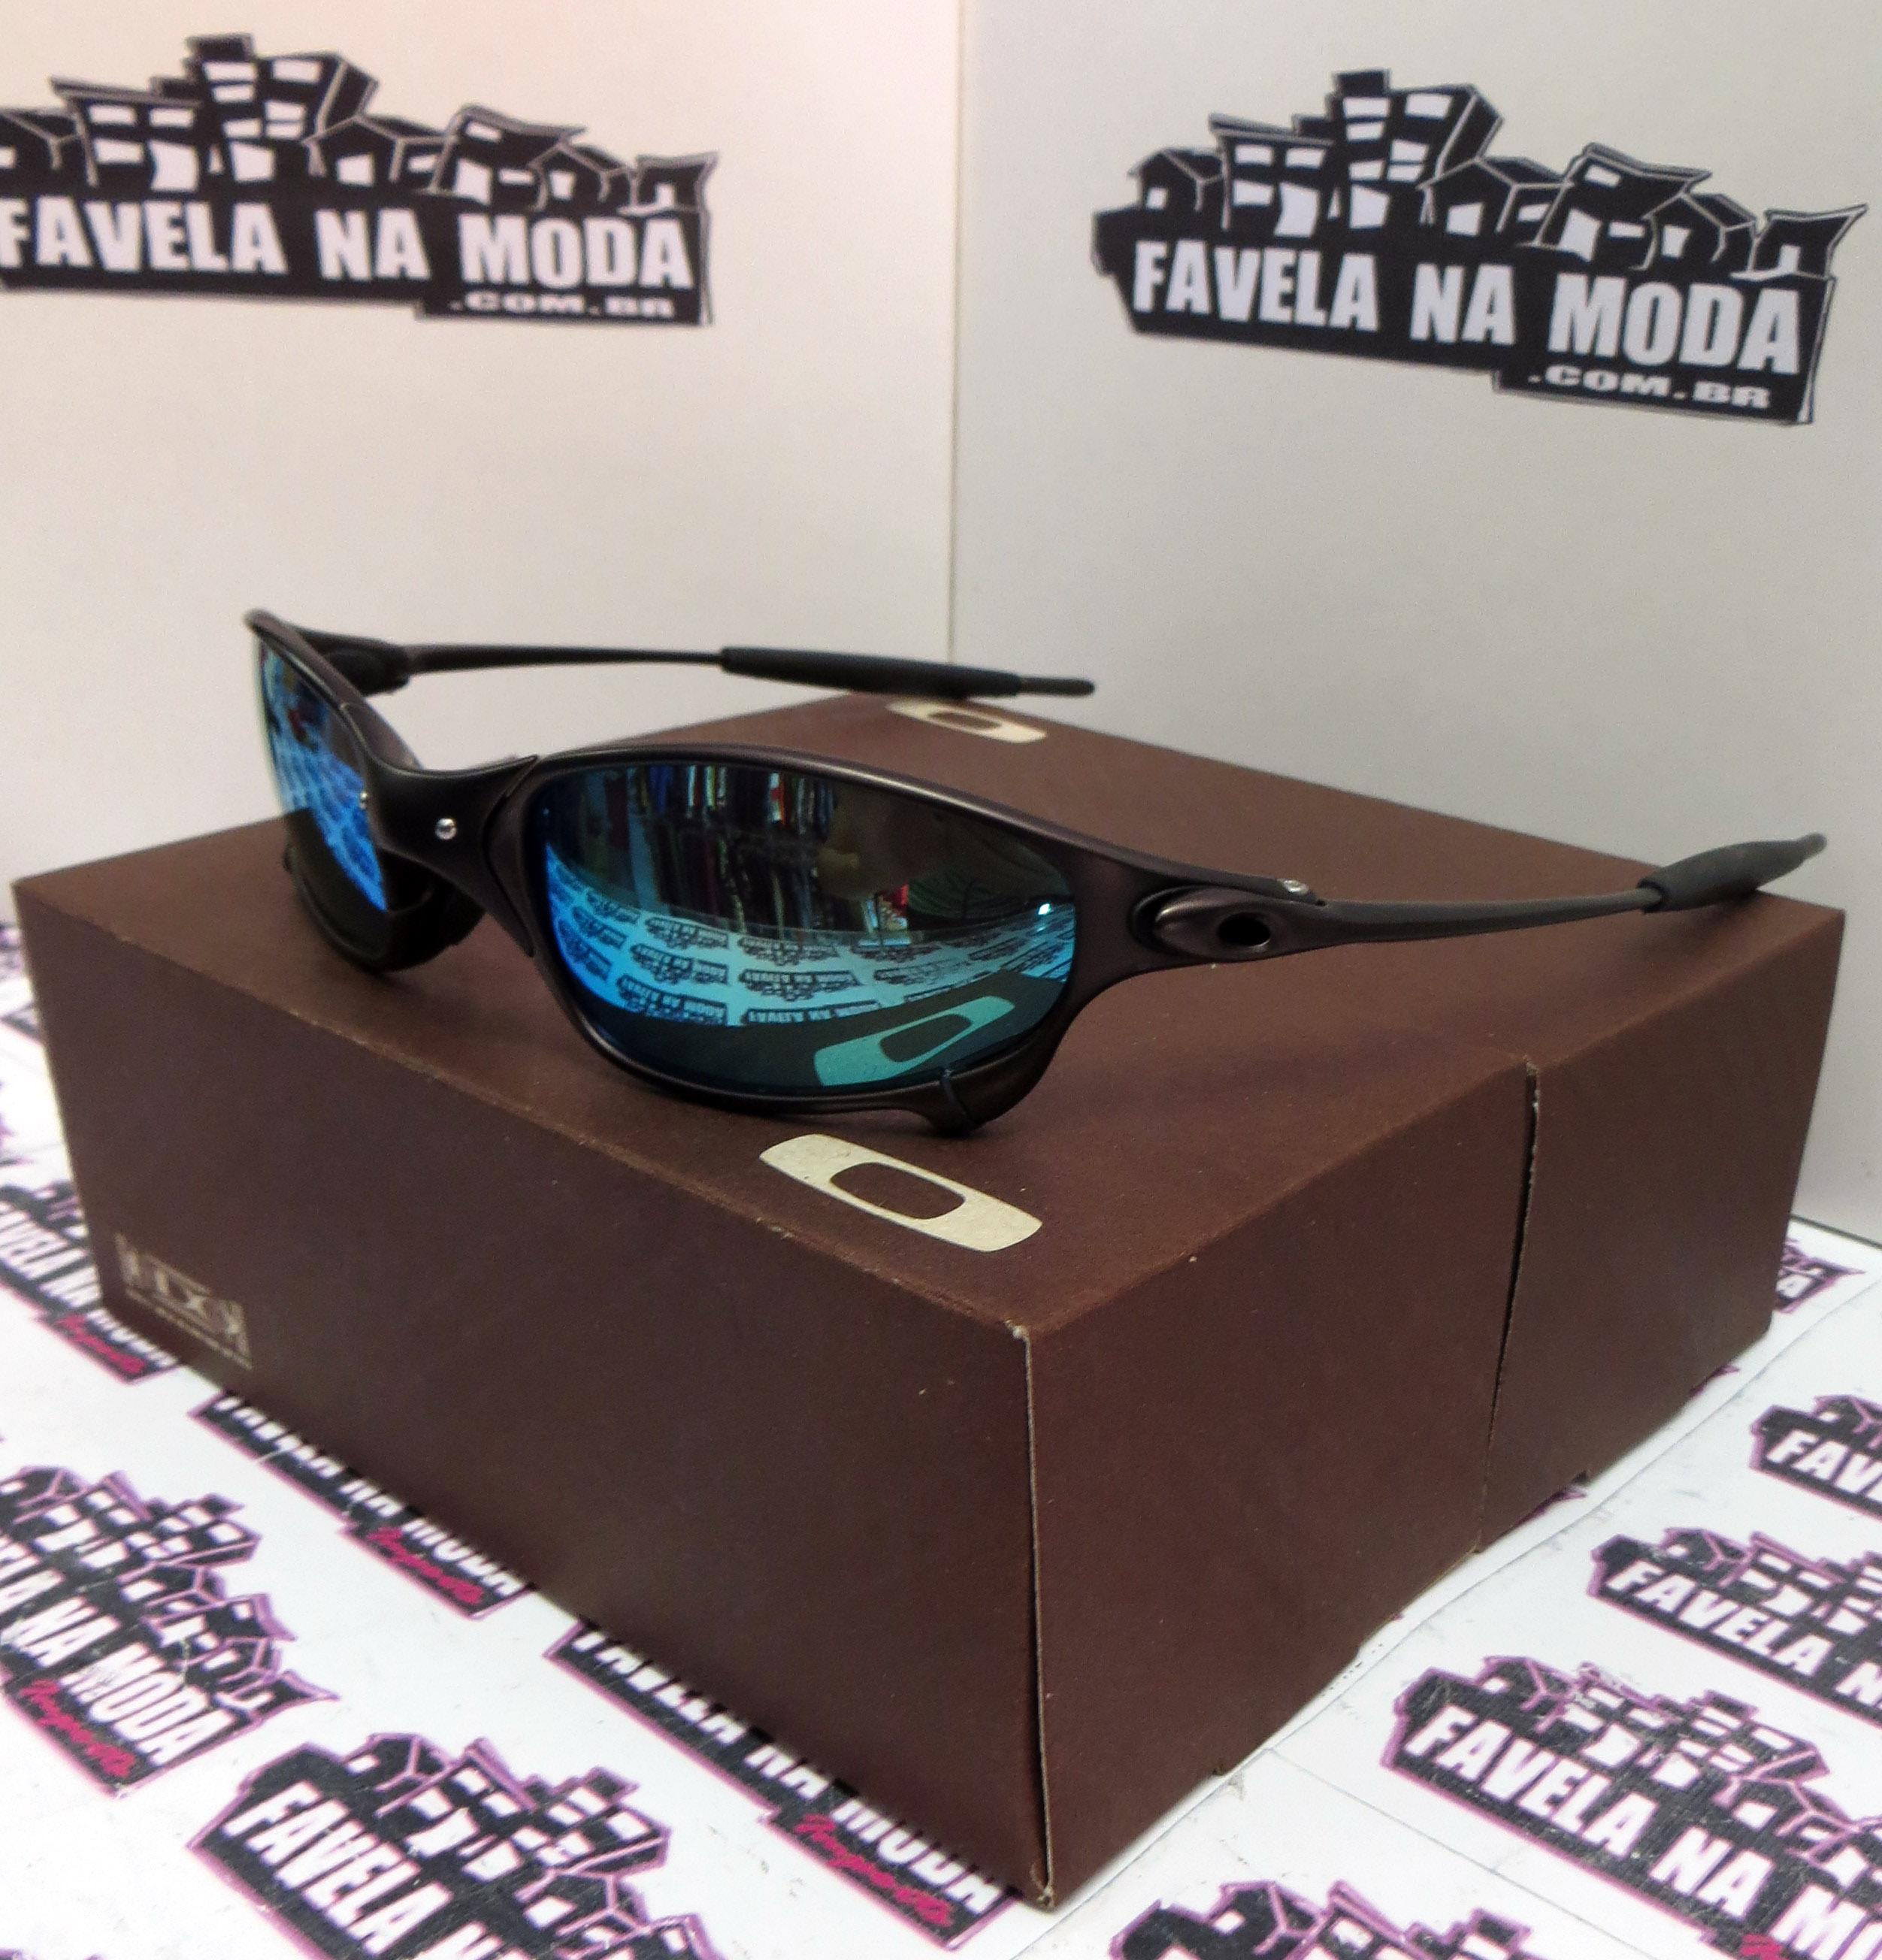 ac79ccd70bc53 Óculos Oakley Juliet - Carbon   Ice Thug   Borrachinhas Pretas ...